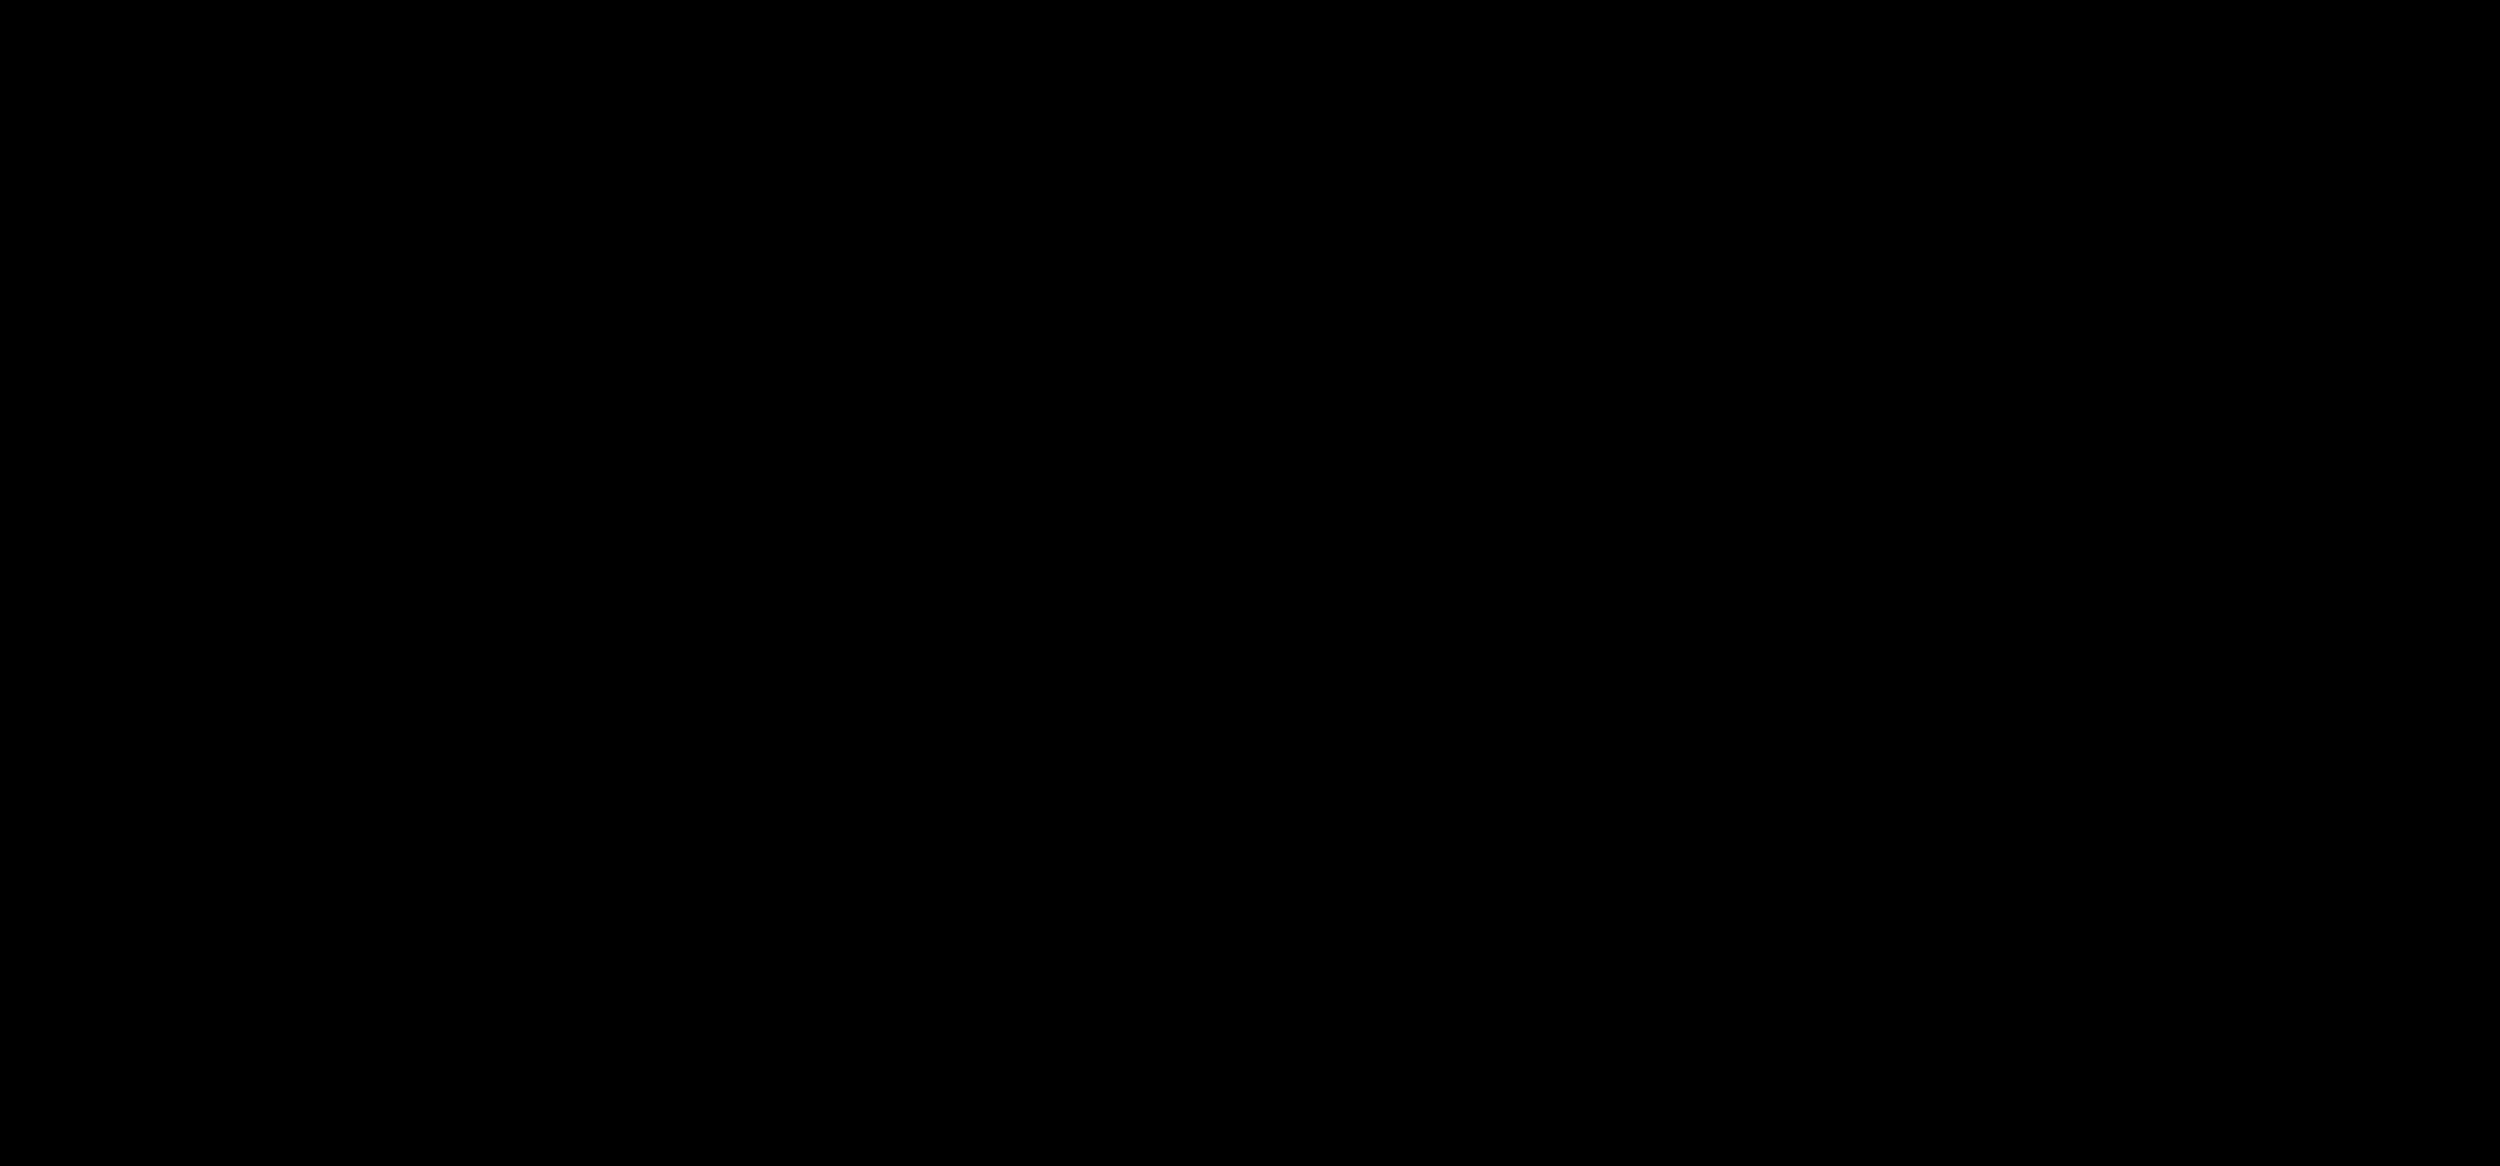 haltia-en-black.png